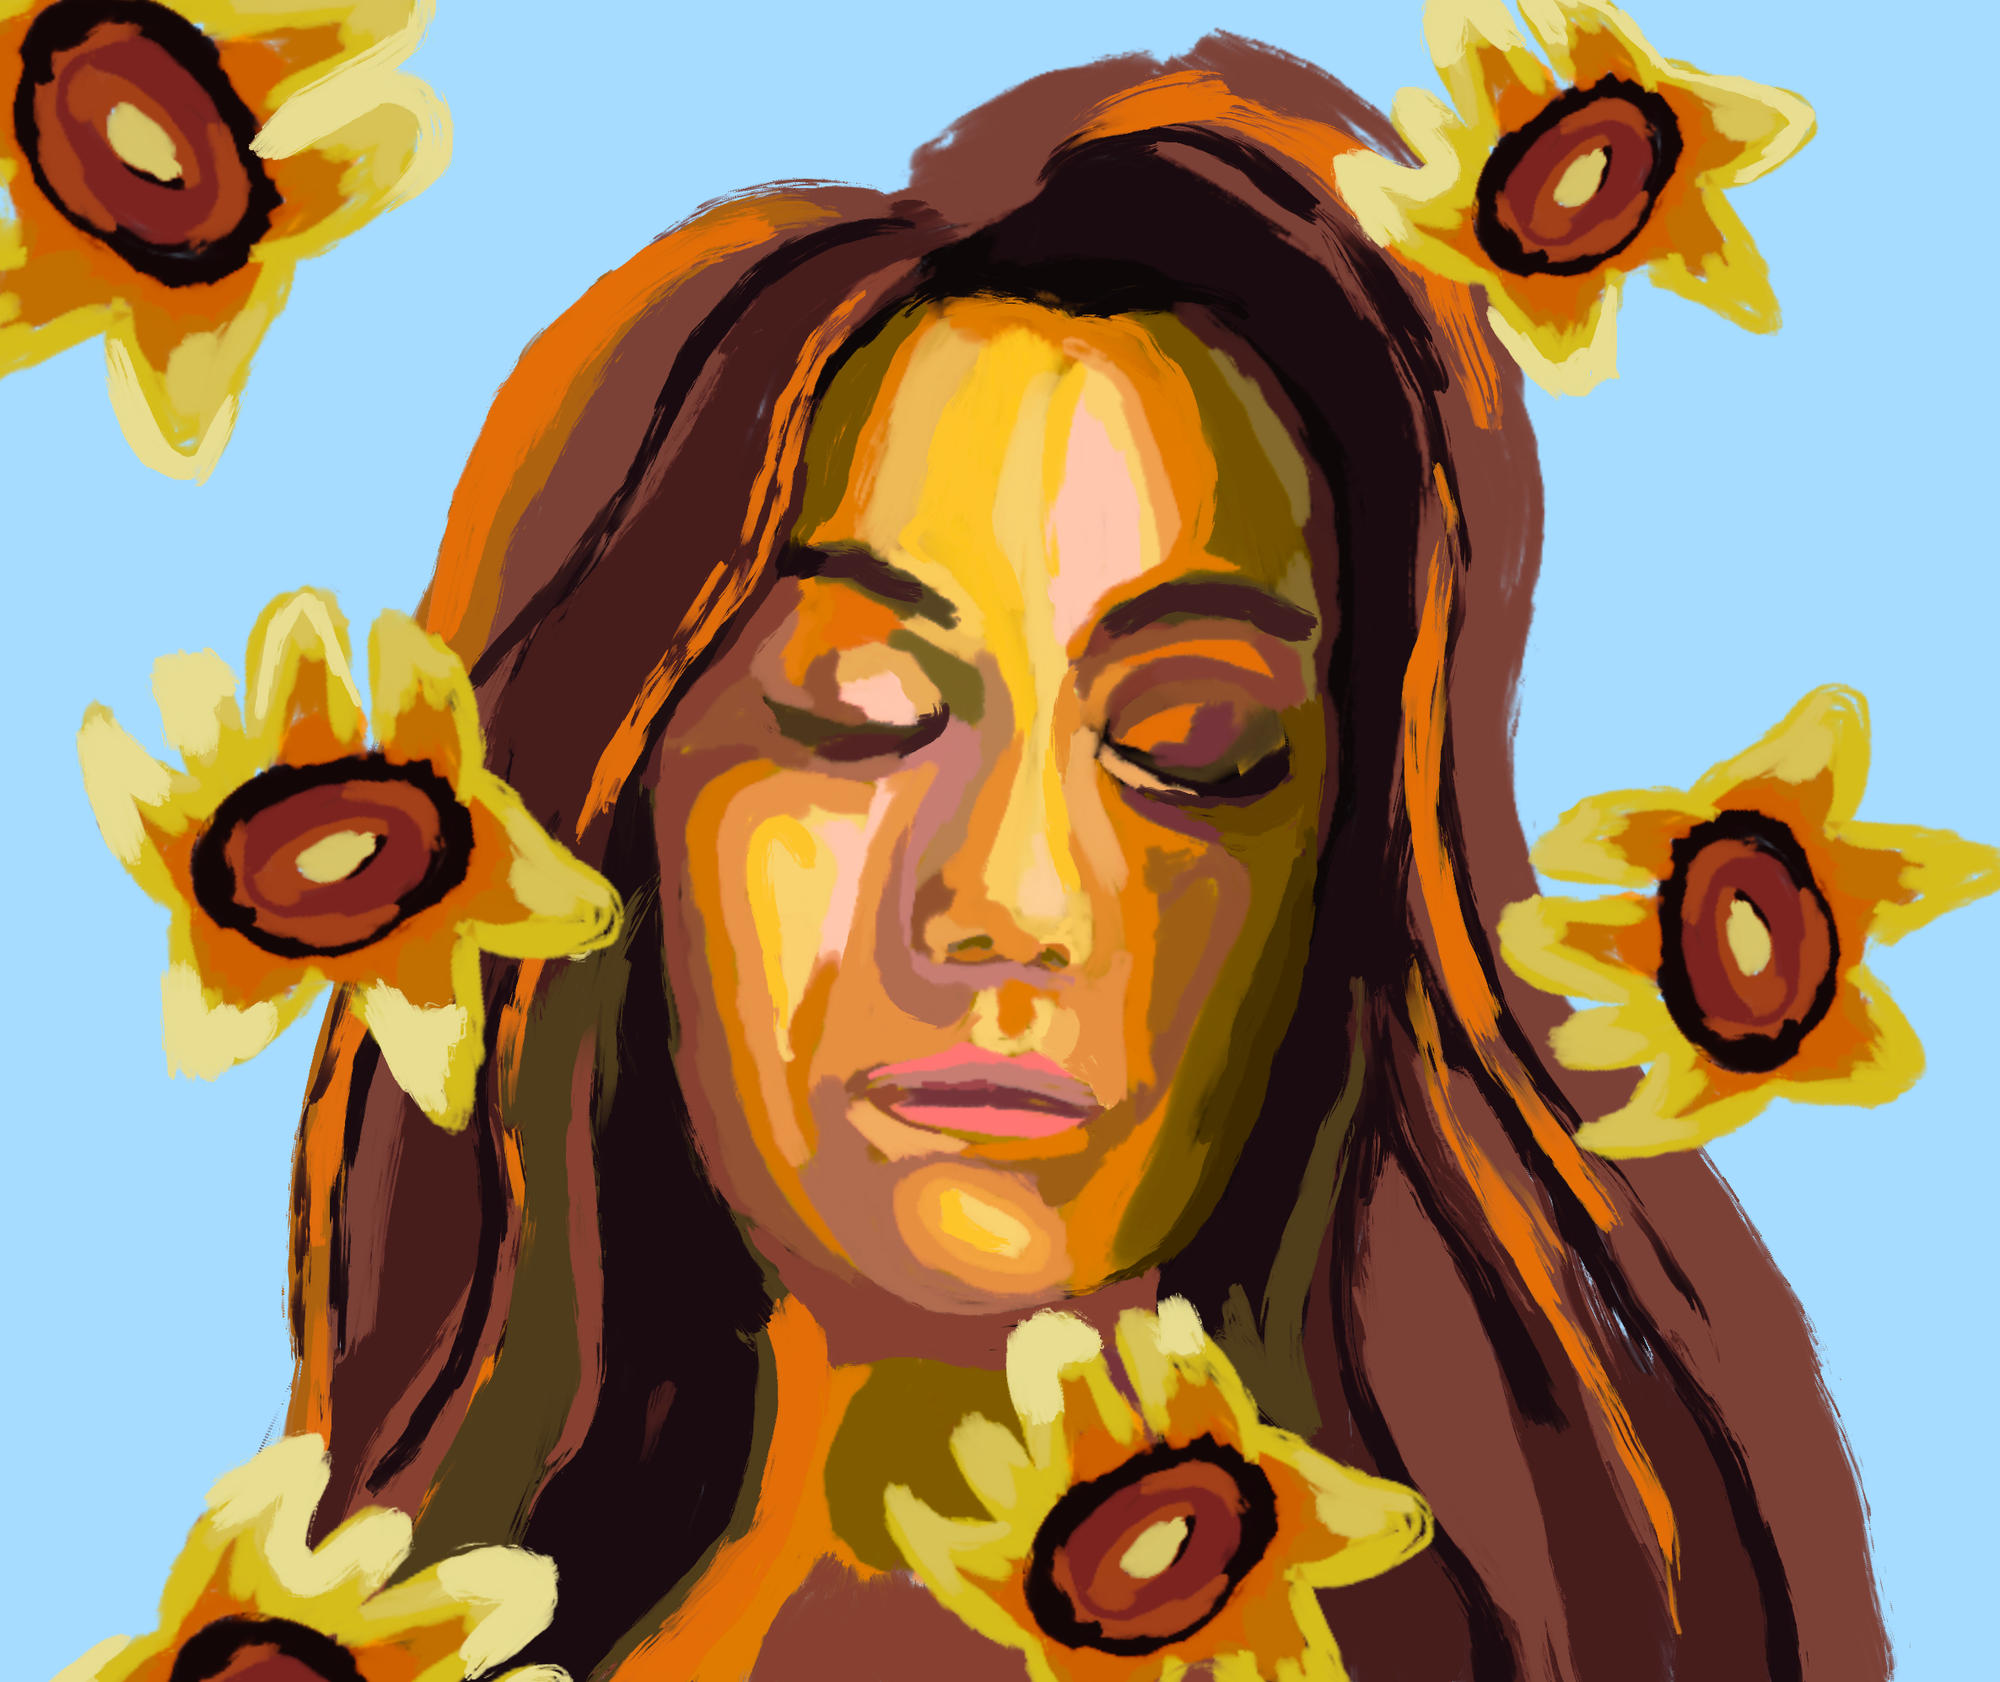 An illustration of Dodie Clark